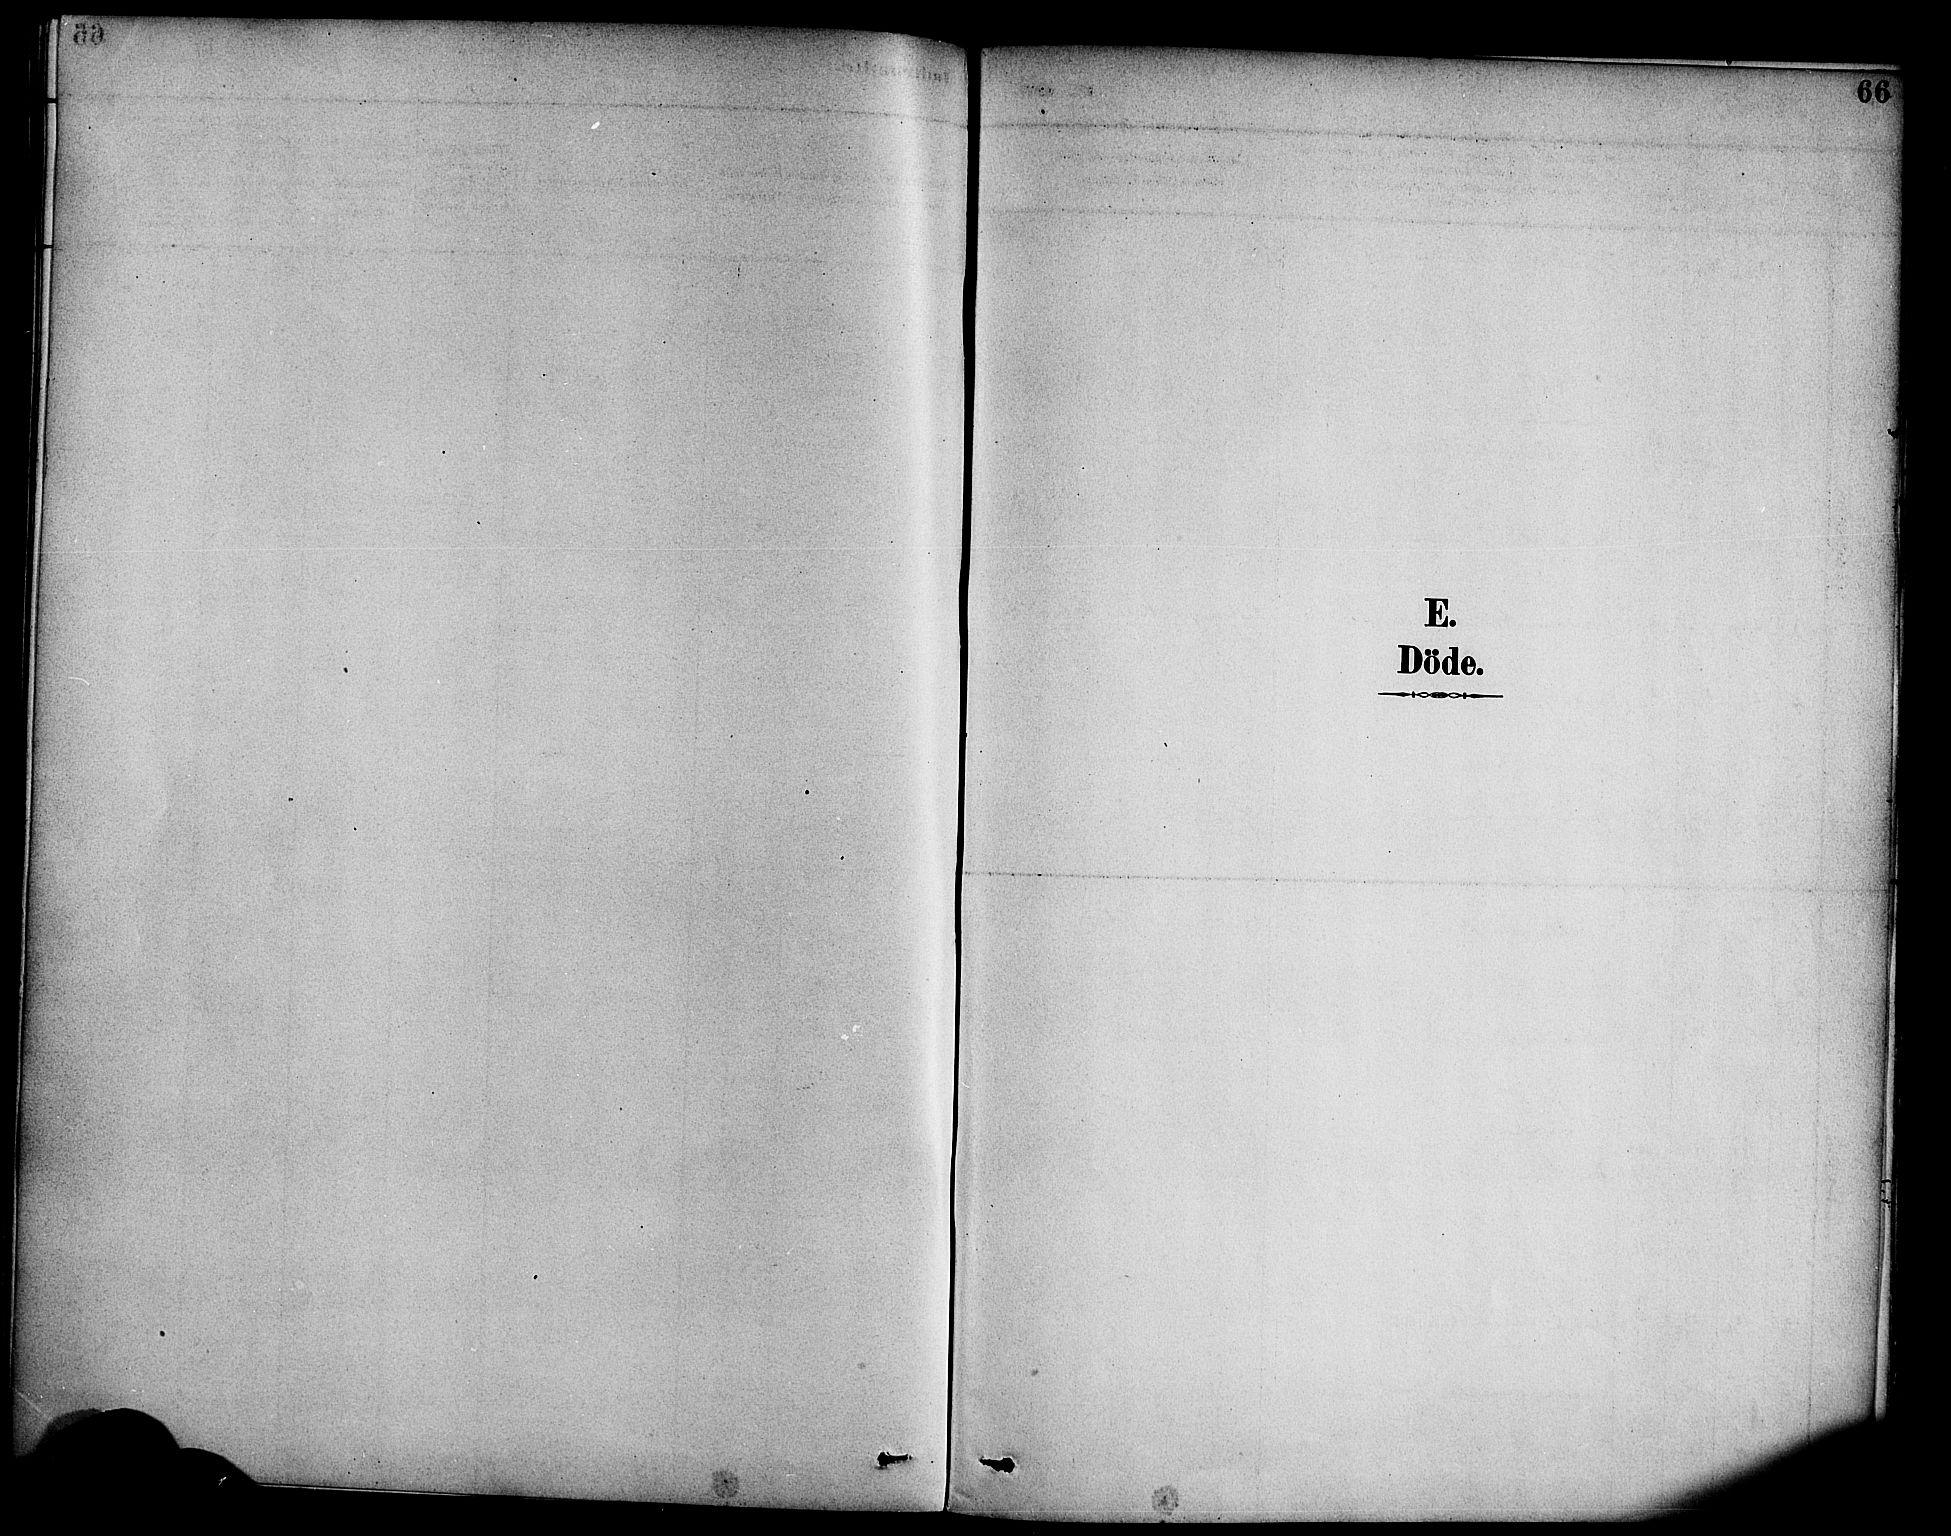 SAB, Hyllestad Sokneprestembete, Ministerialbok nr. C 1, 1886-1904, s. 66